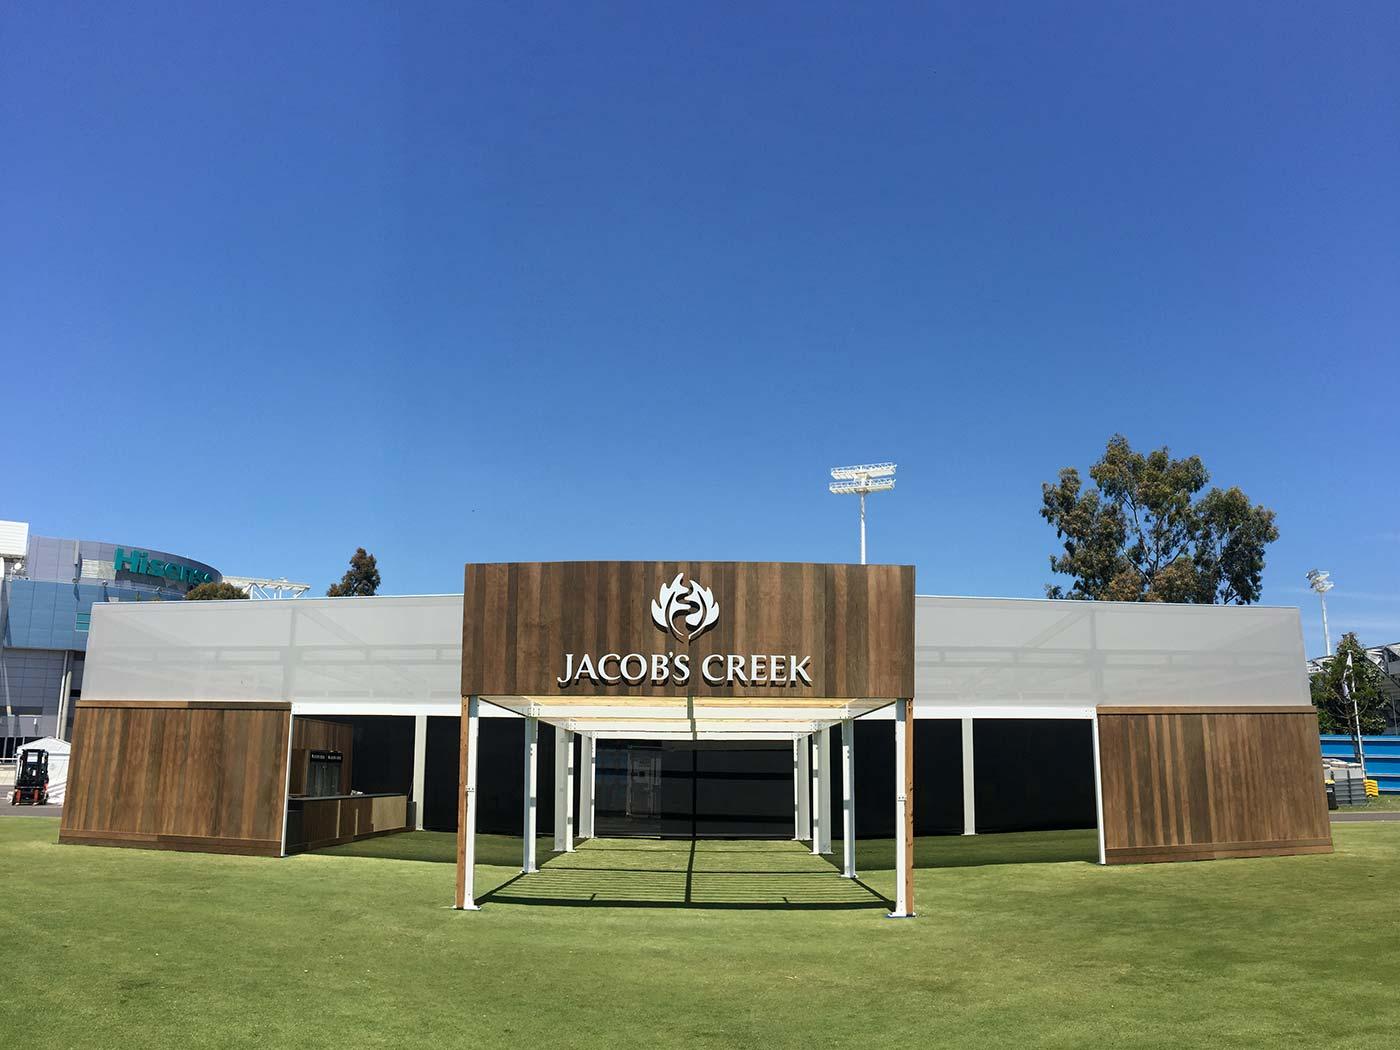 Jacobs-Creek-Activation-1